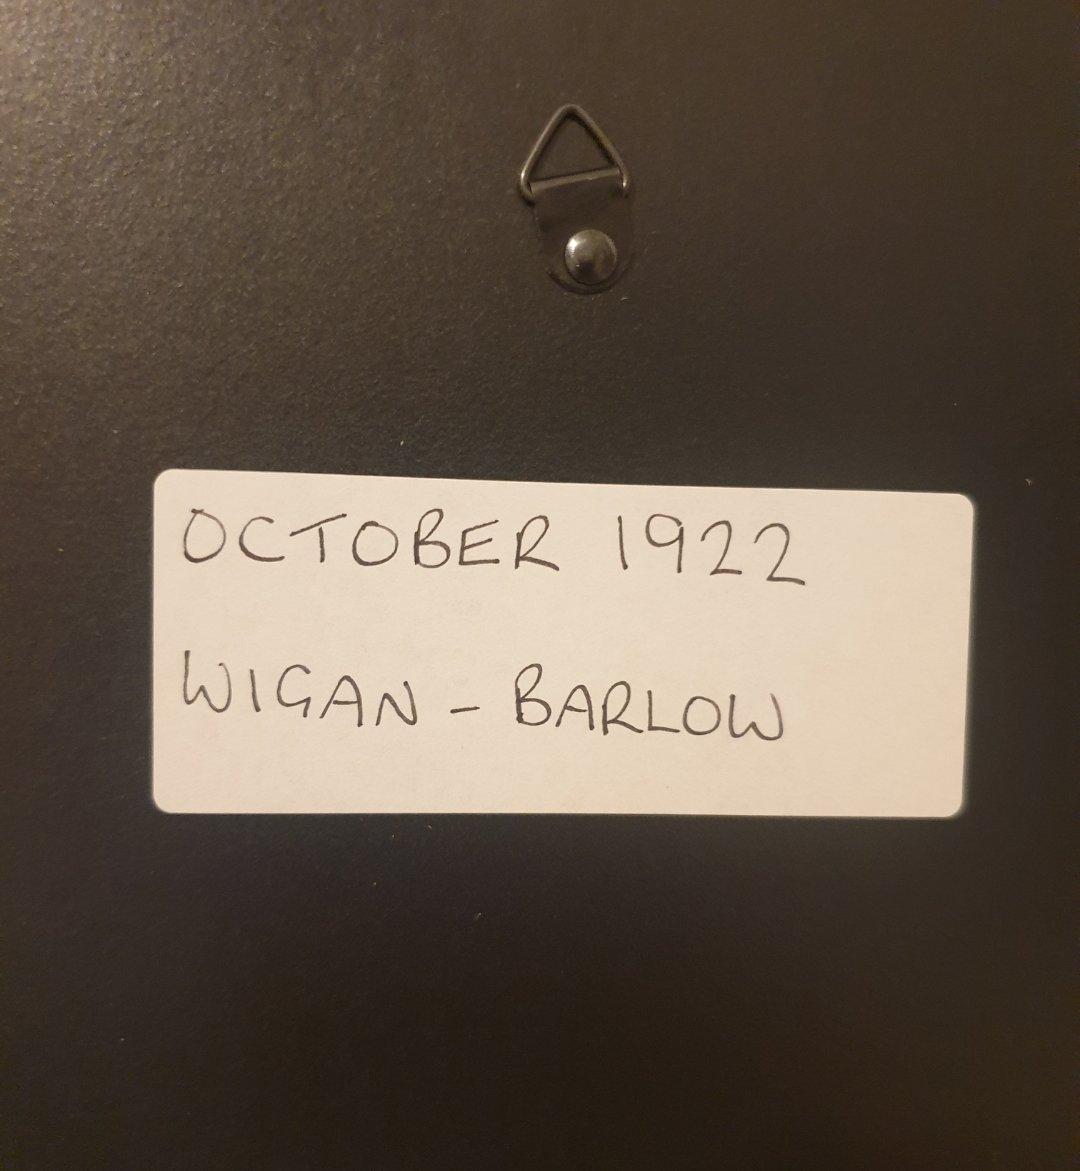 1980 Original 1922 Wigan-Barlow Framed Advert  For Sale (picture 2 of 3)